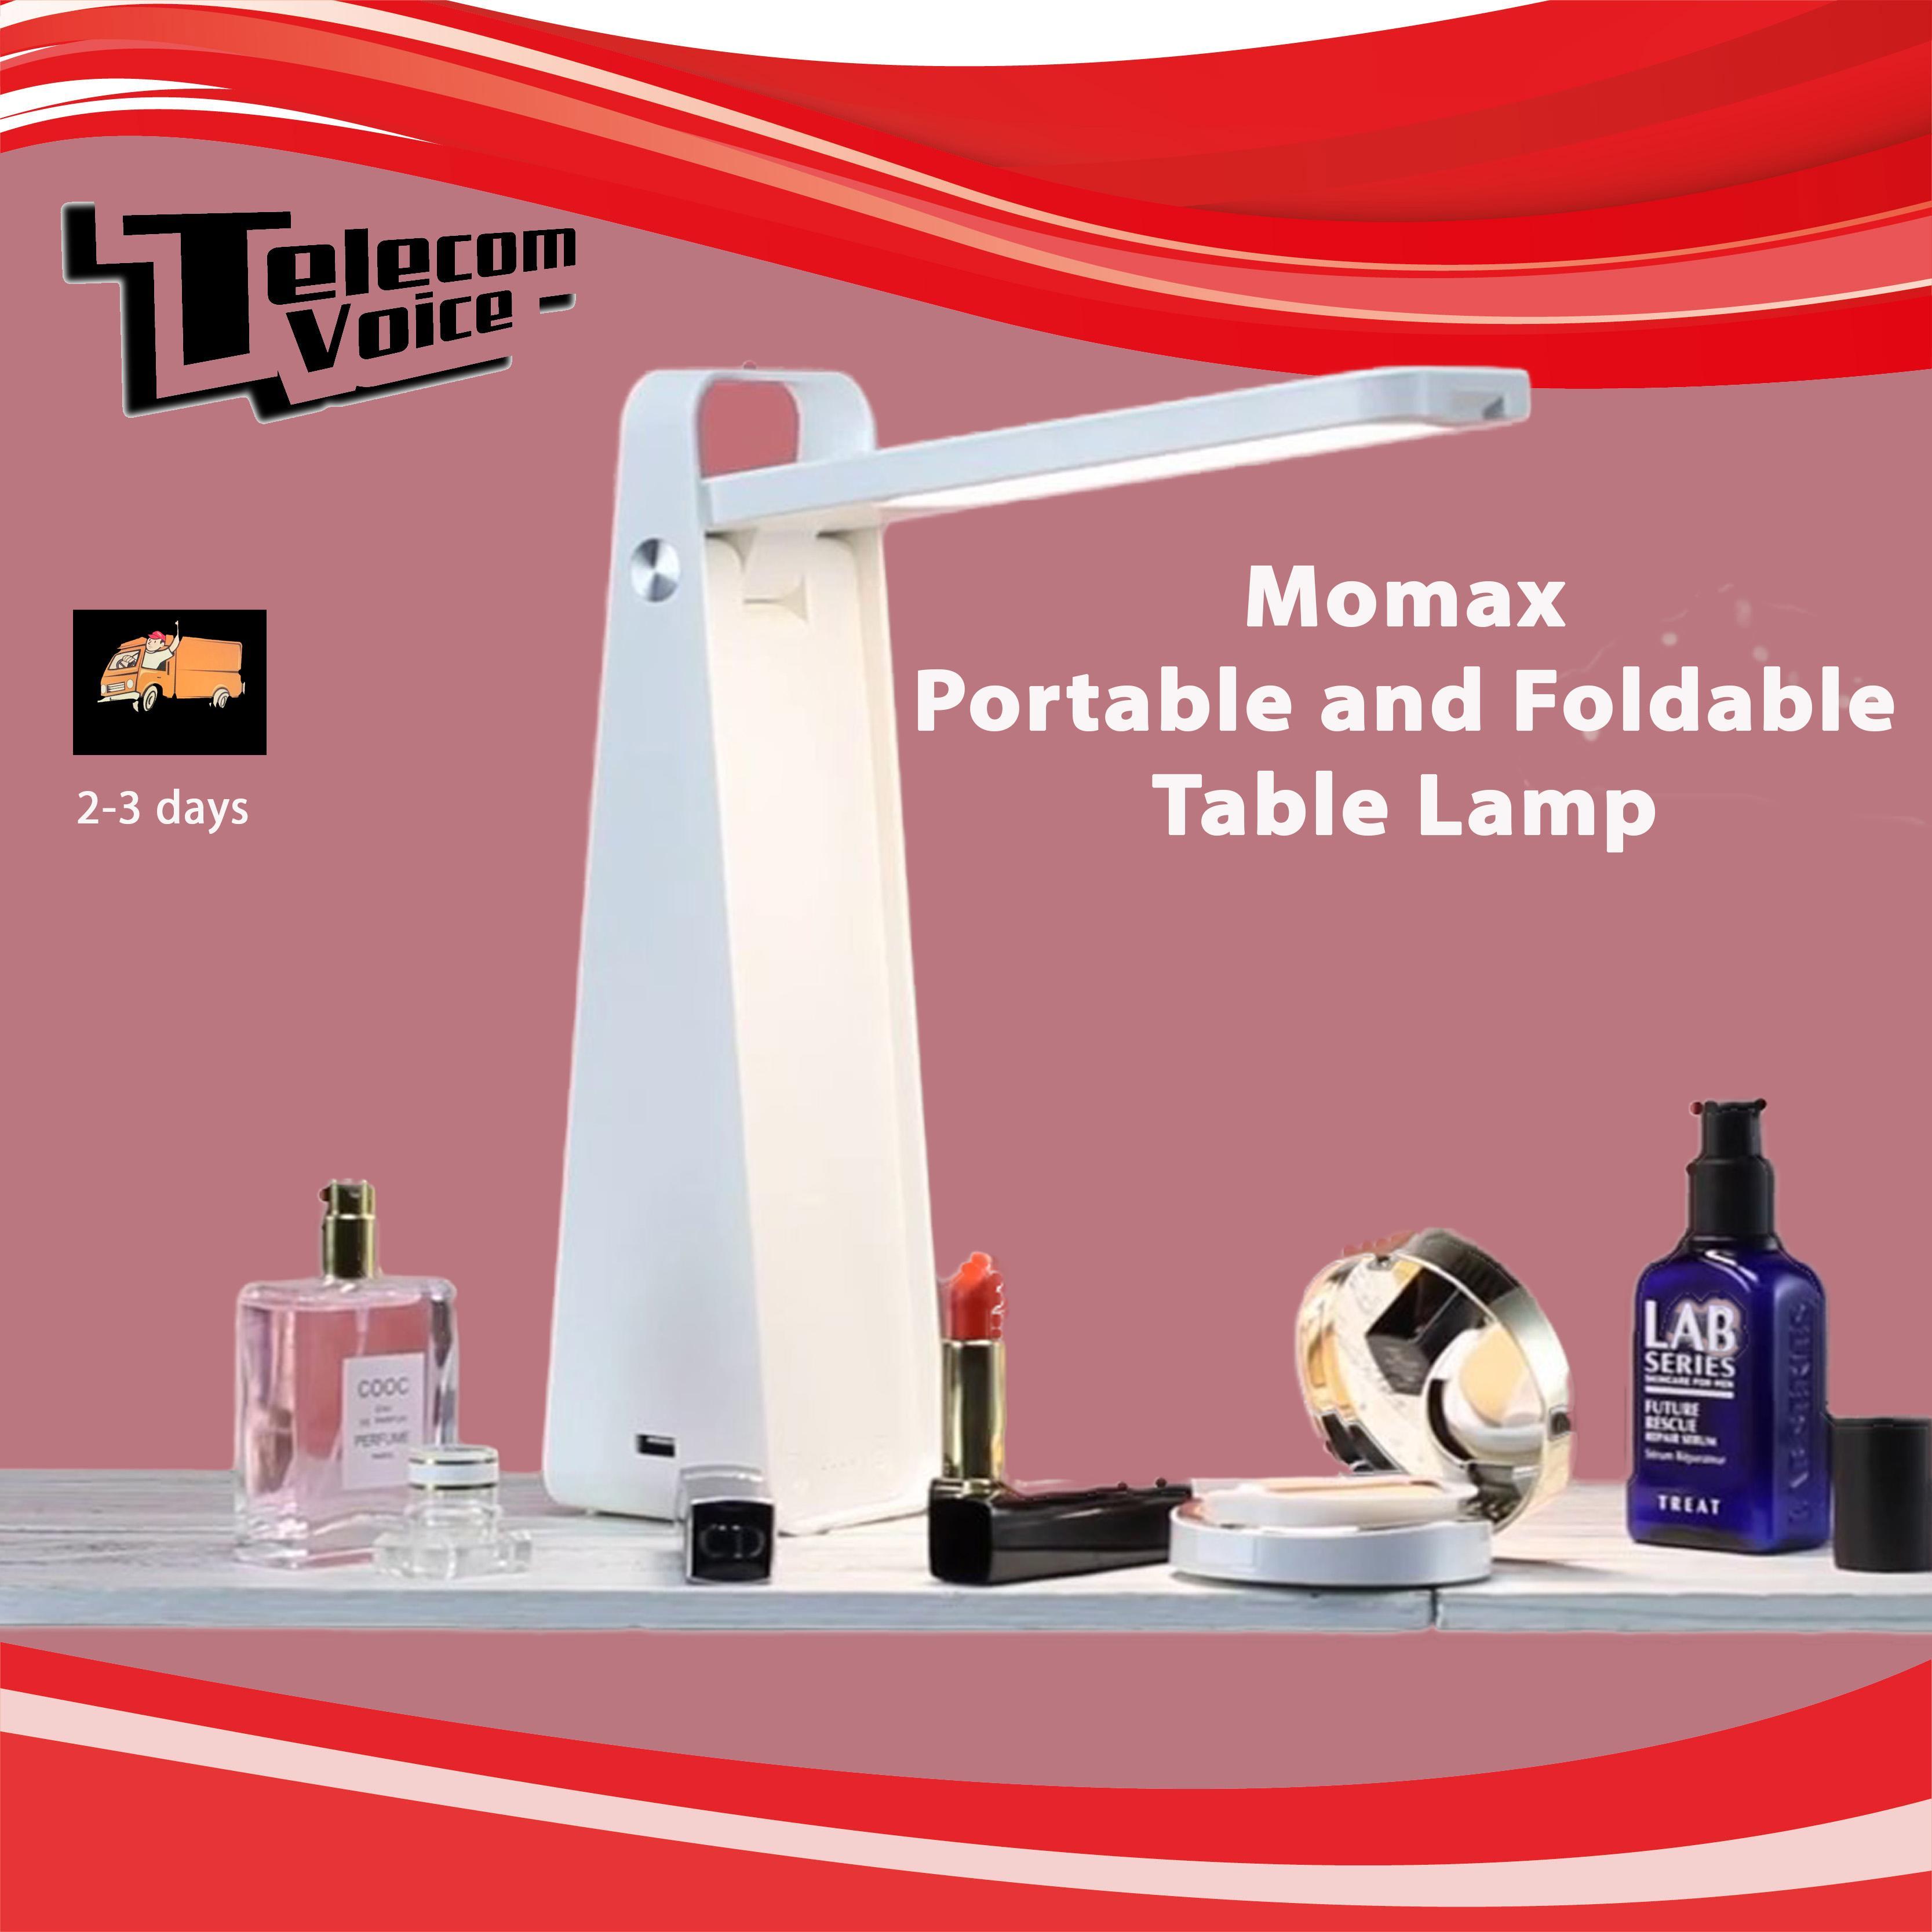 Momax LED Light Portable Lamp